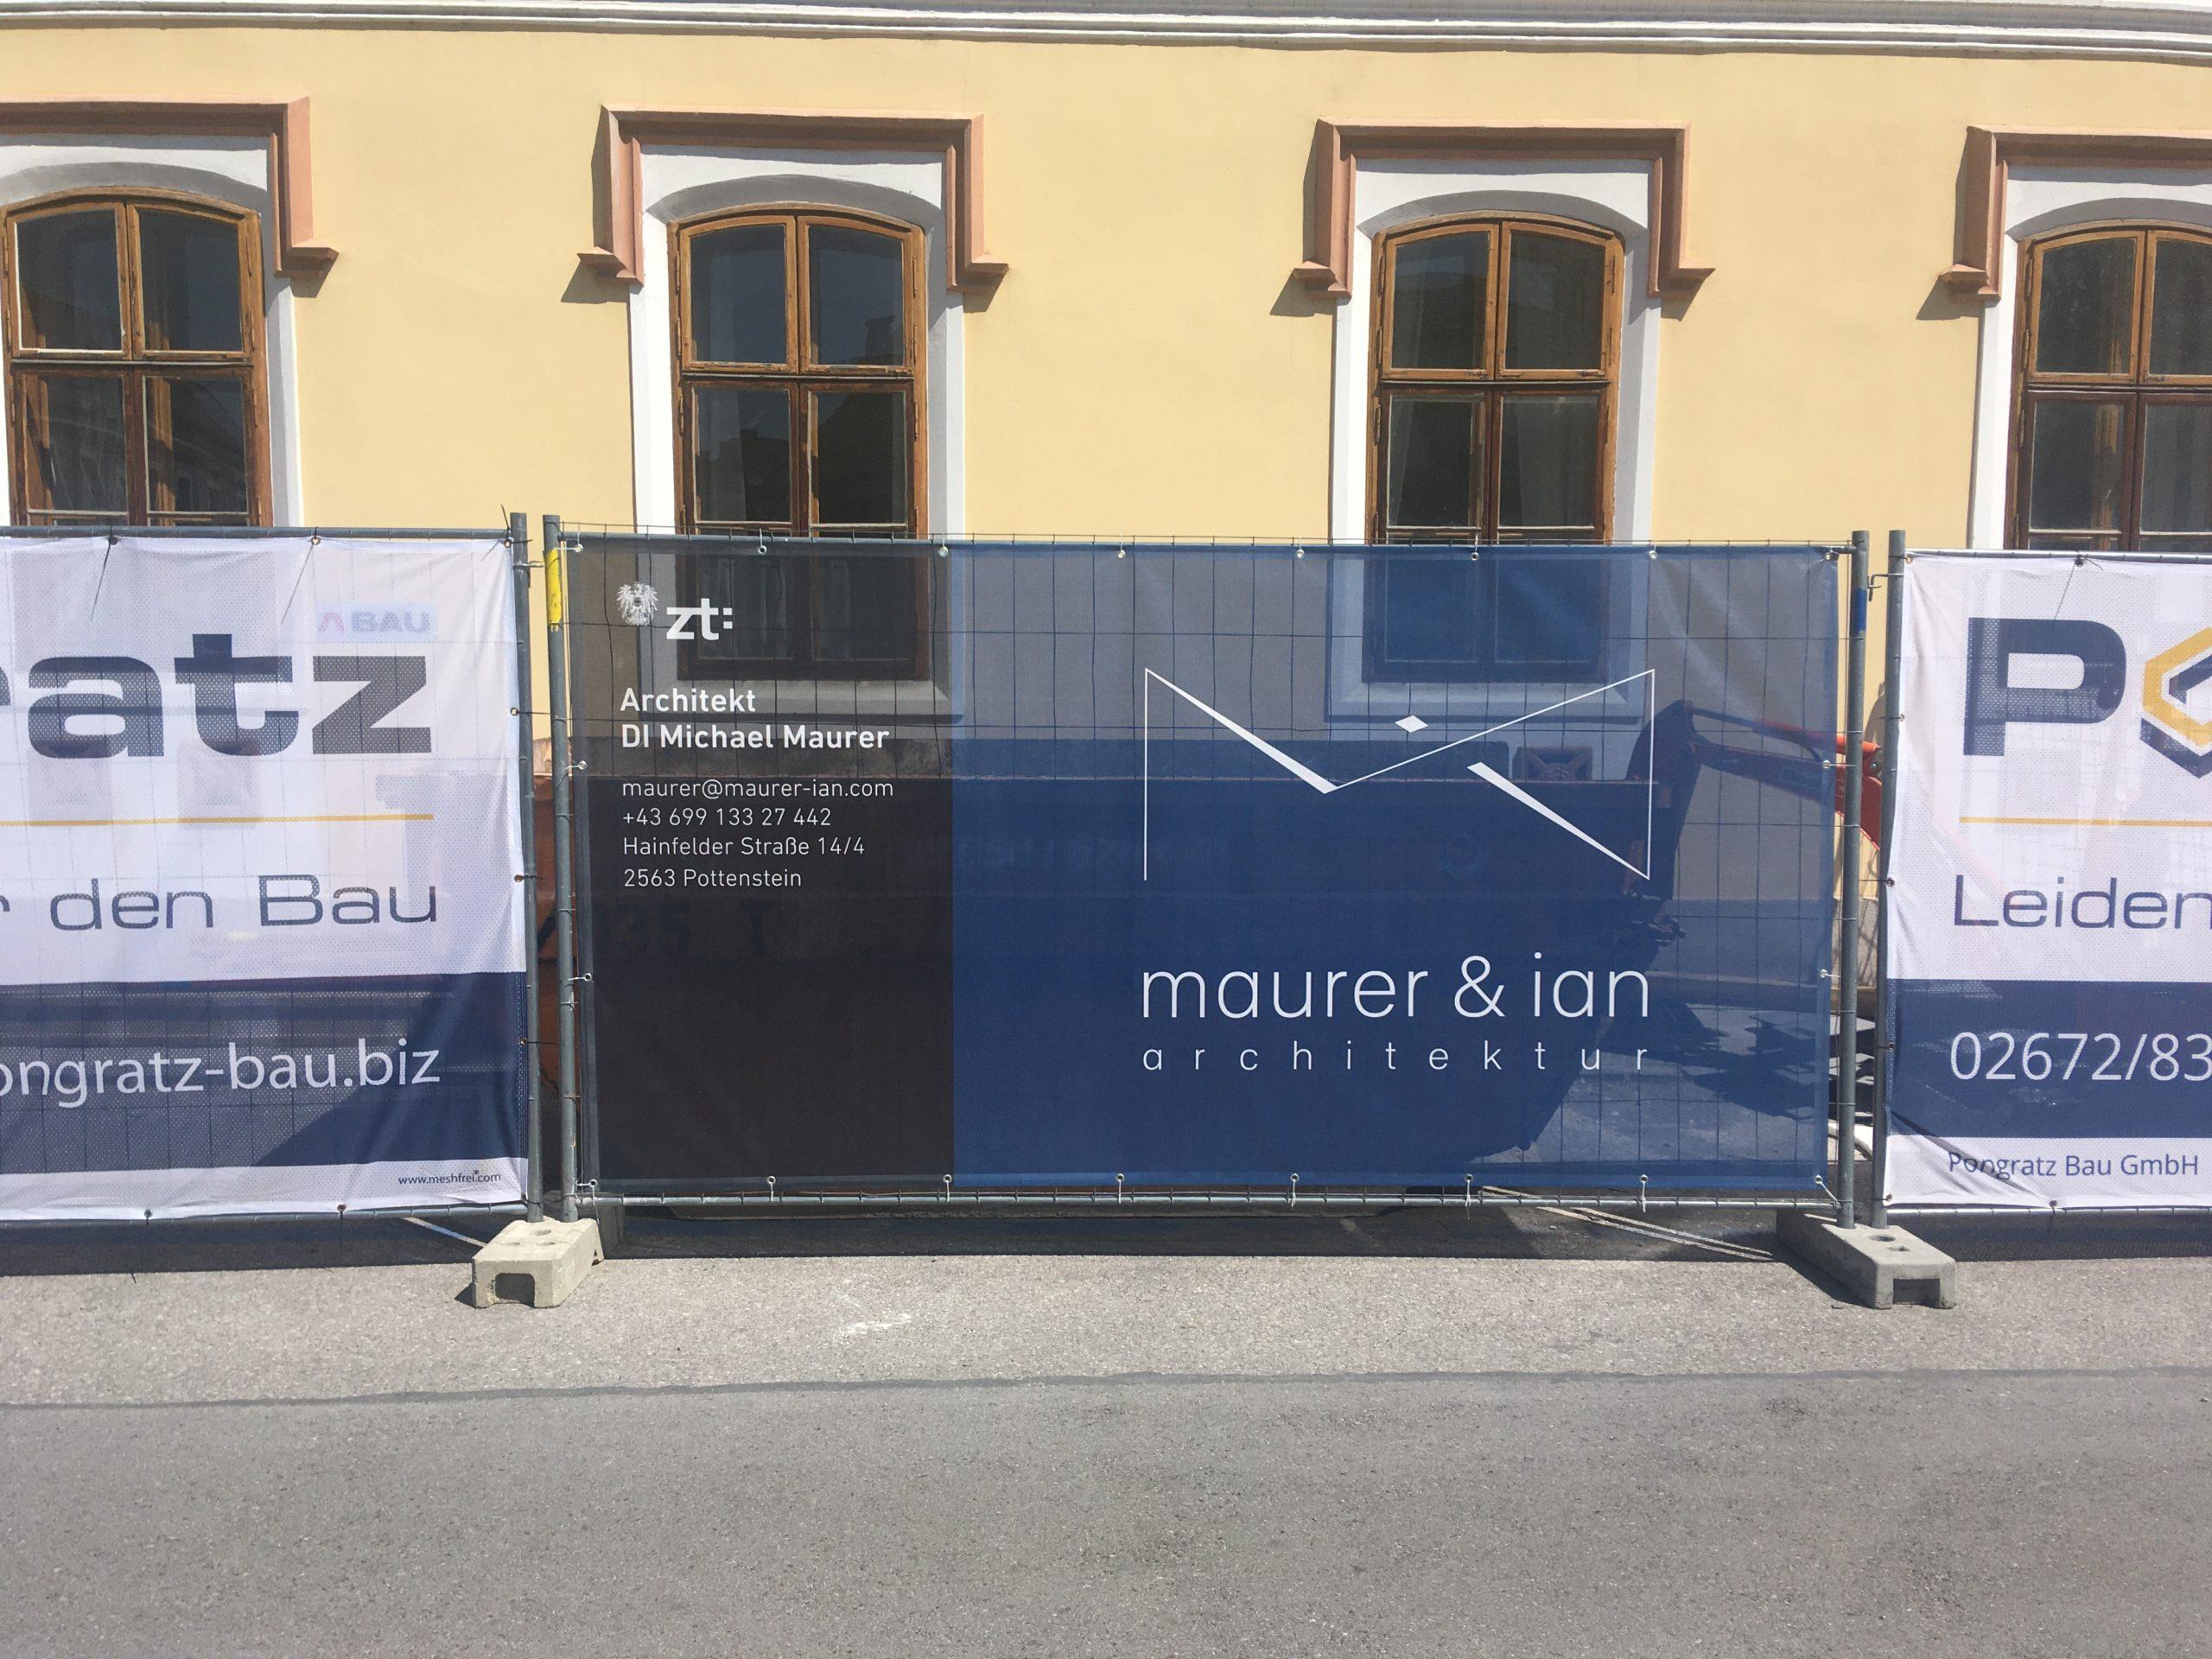 Bauzaunblende_Architekt_DI_Michael_Maurer